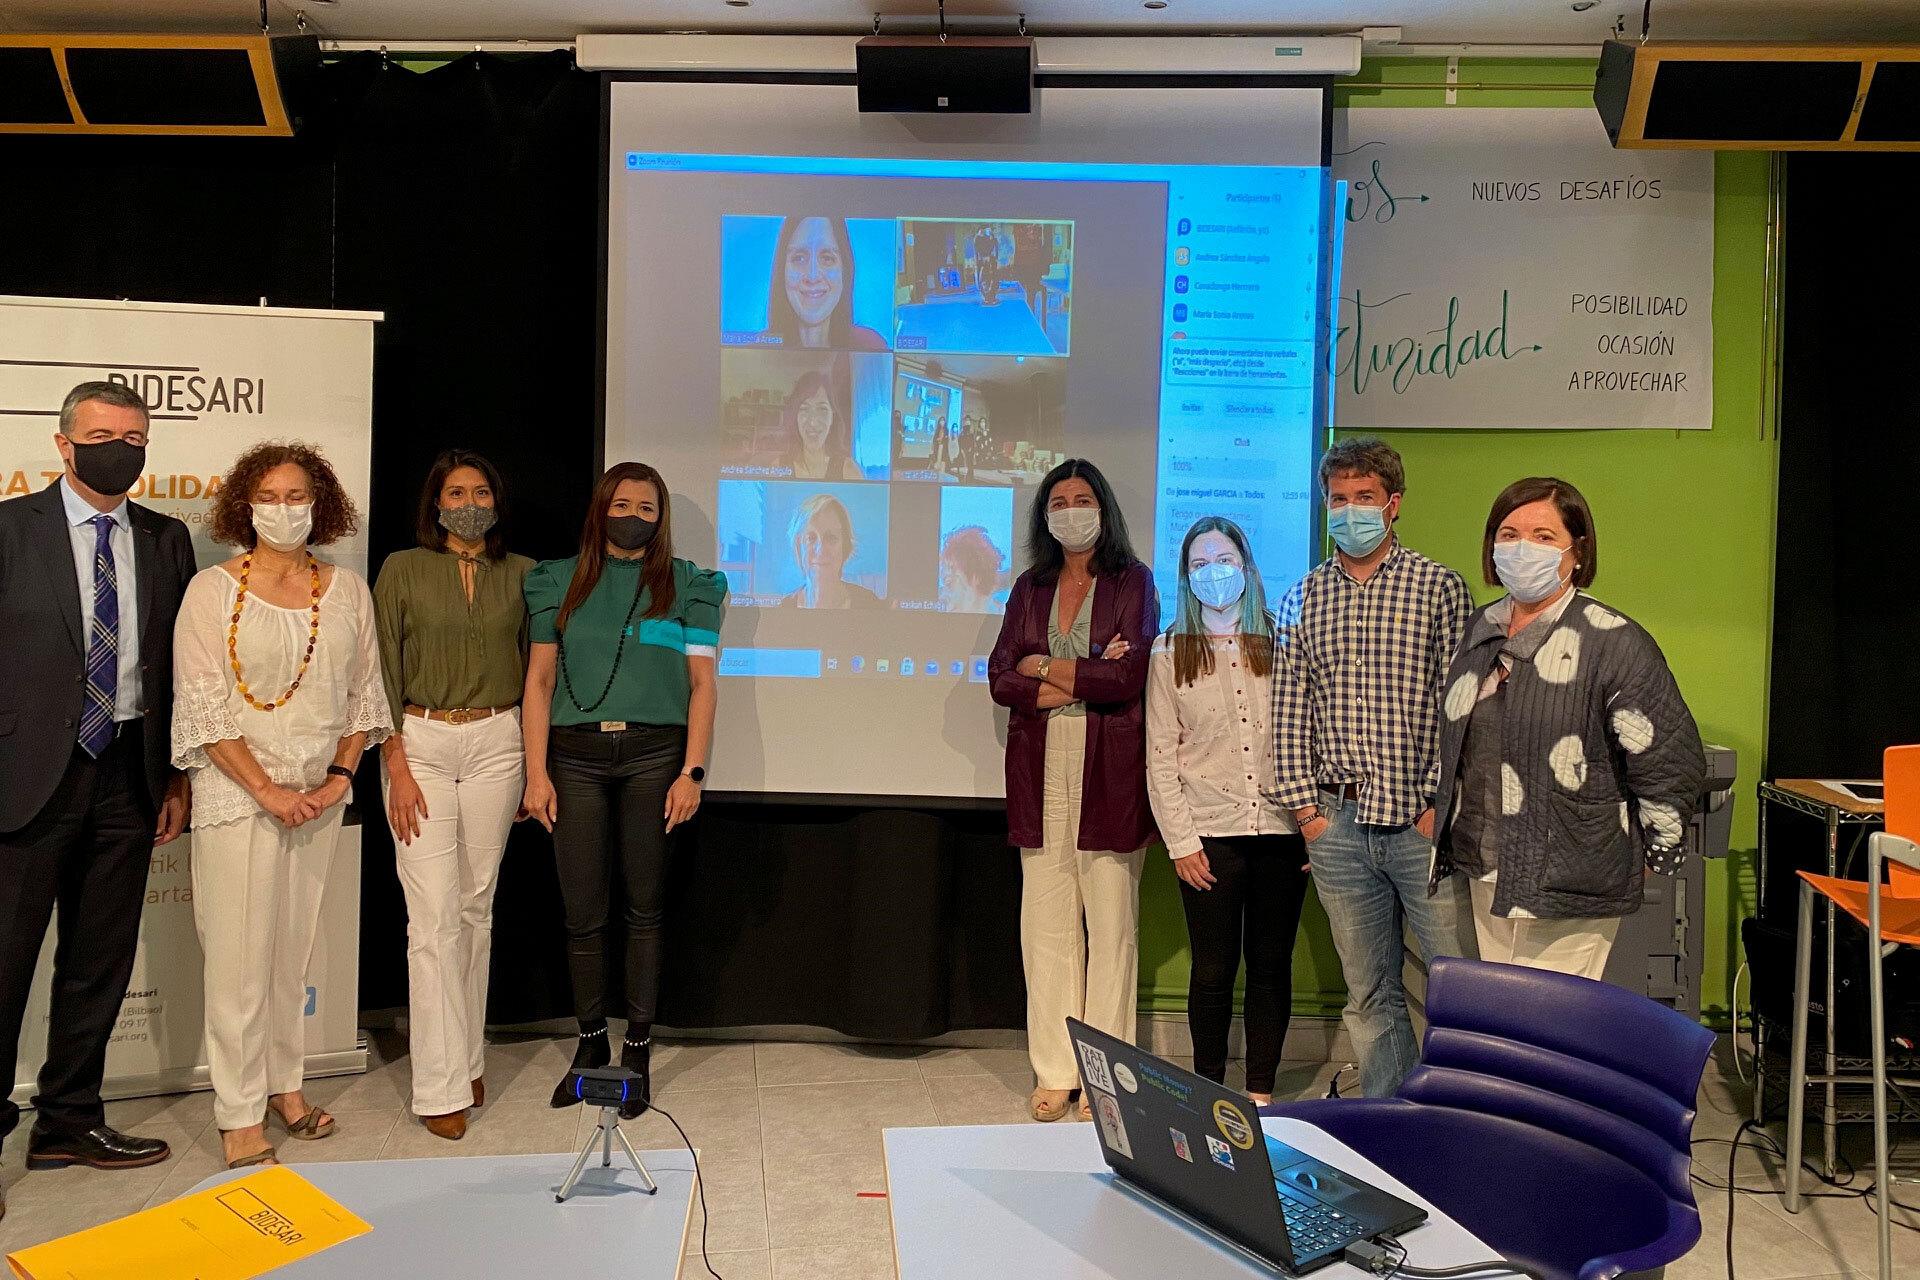 CEBOK voluntariado corporativo pro bono a favor de Bidesari